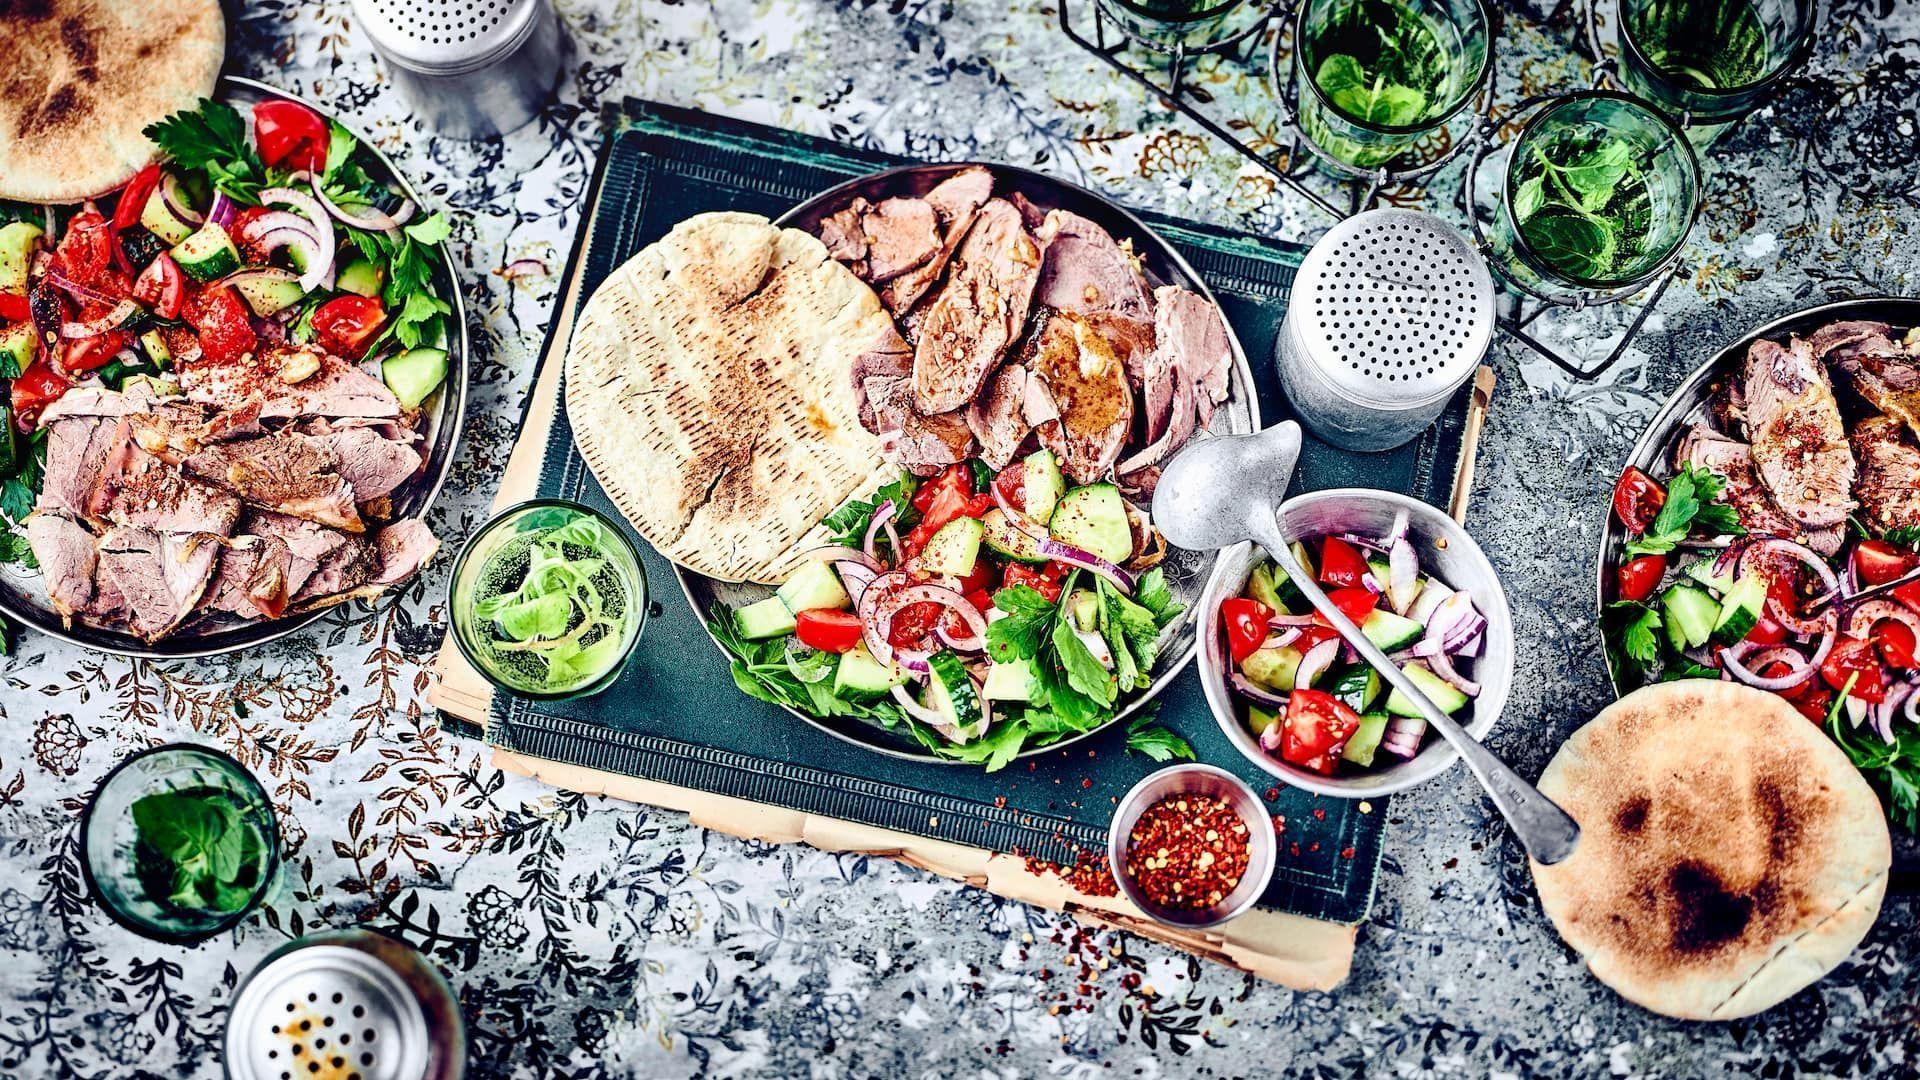 Levante-Küche – orientalisch lecker  EDEKA #levanteküche Levante